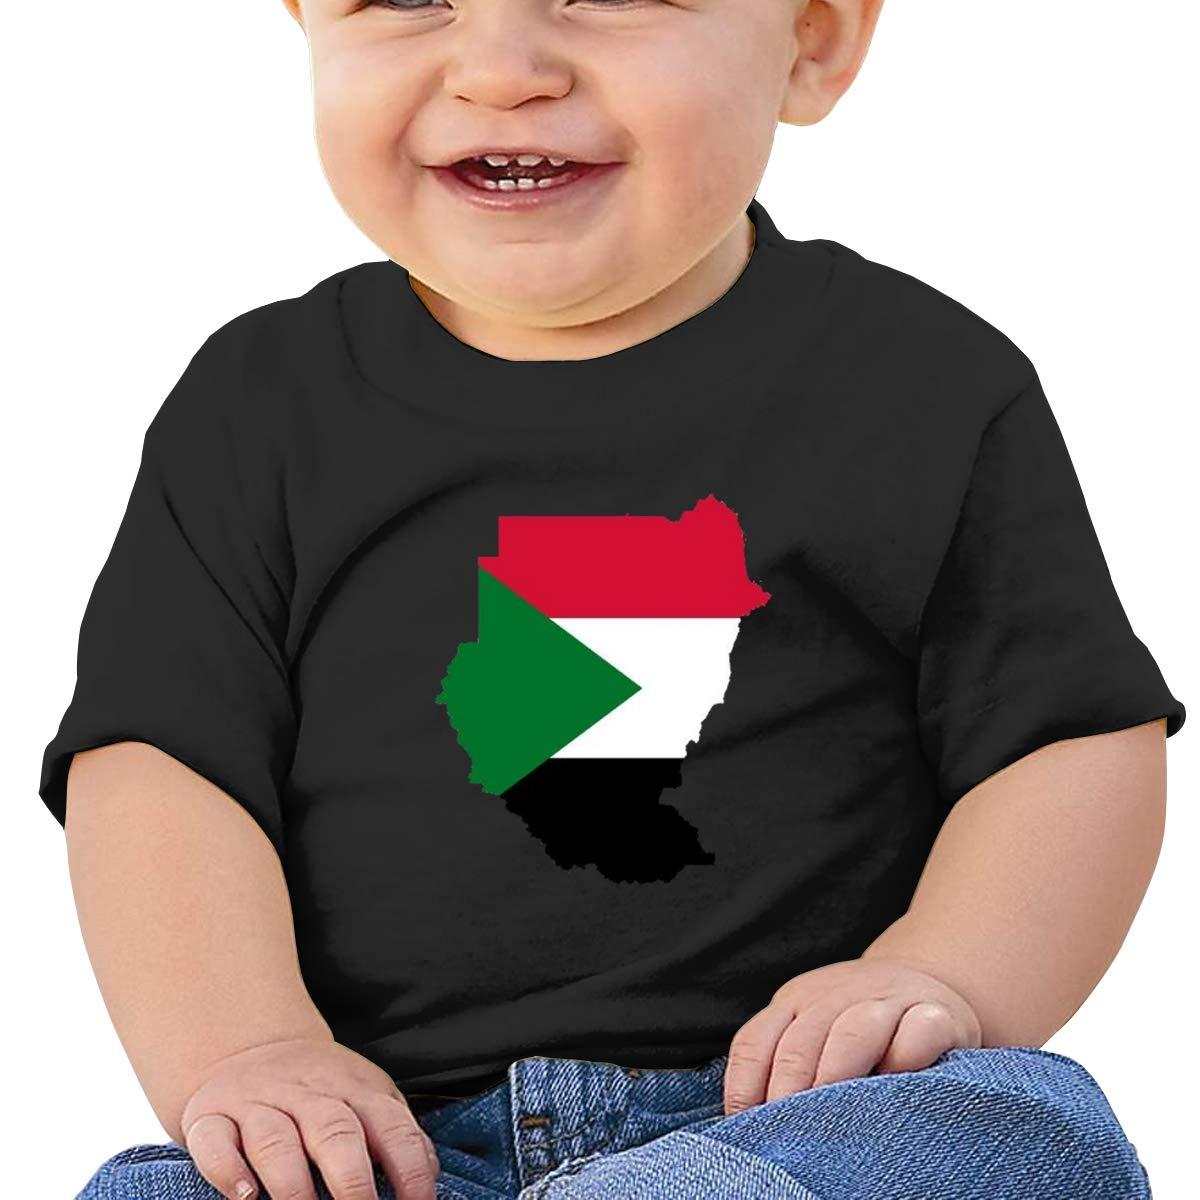 Moniery Sudan Flag Map Short-Sleeve Shirts Baby Boy Kids